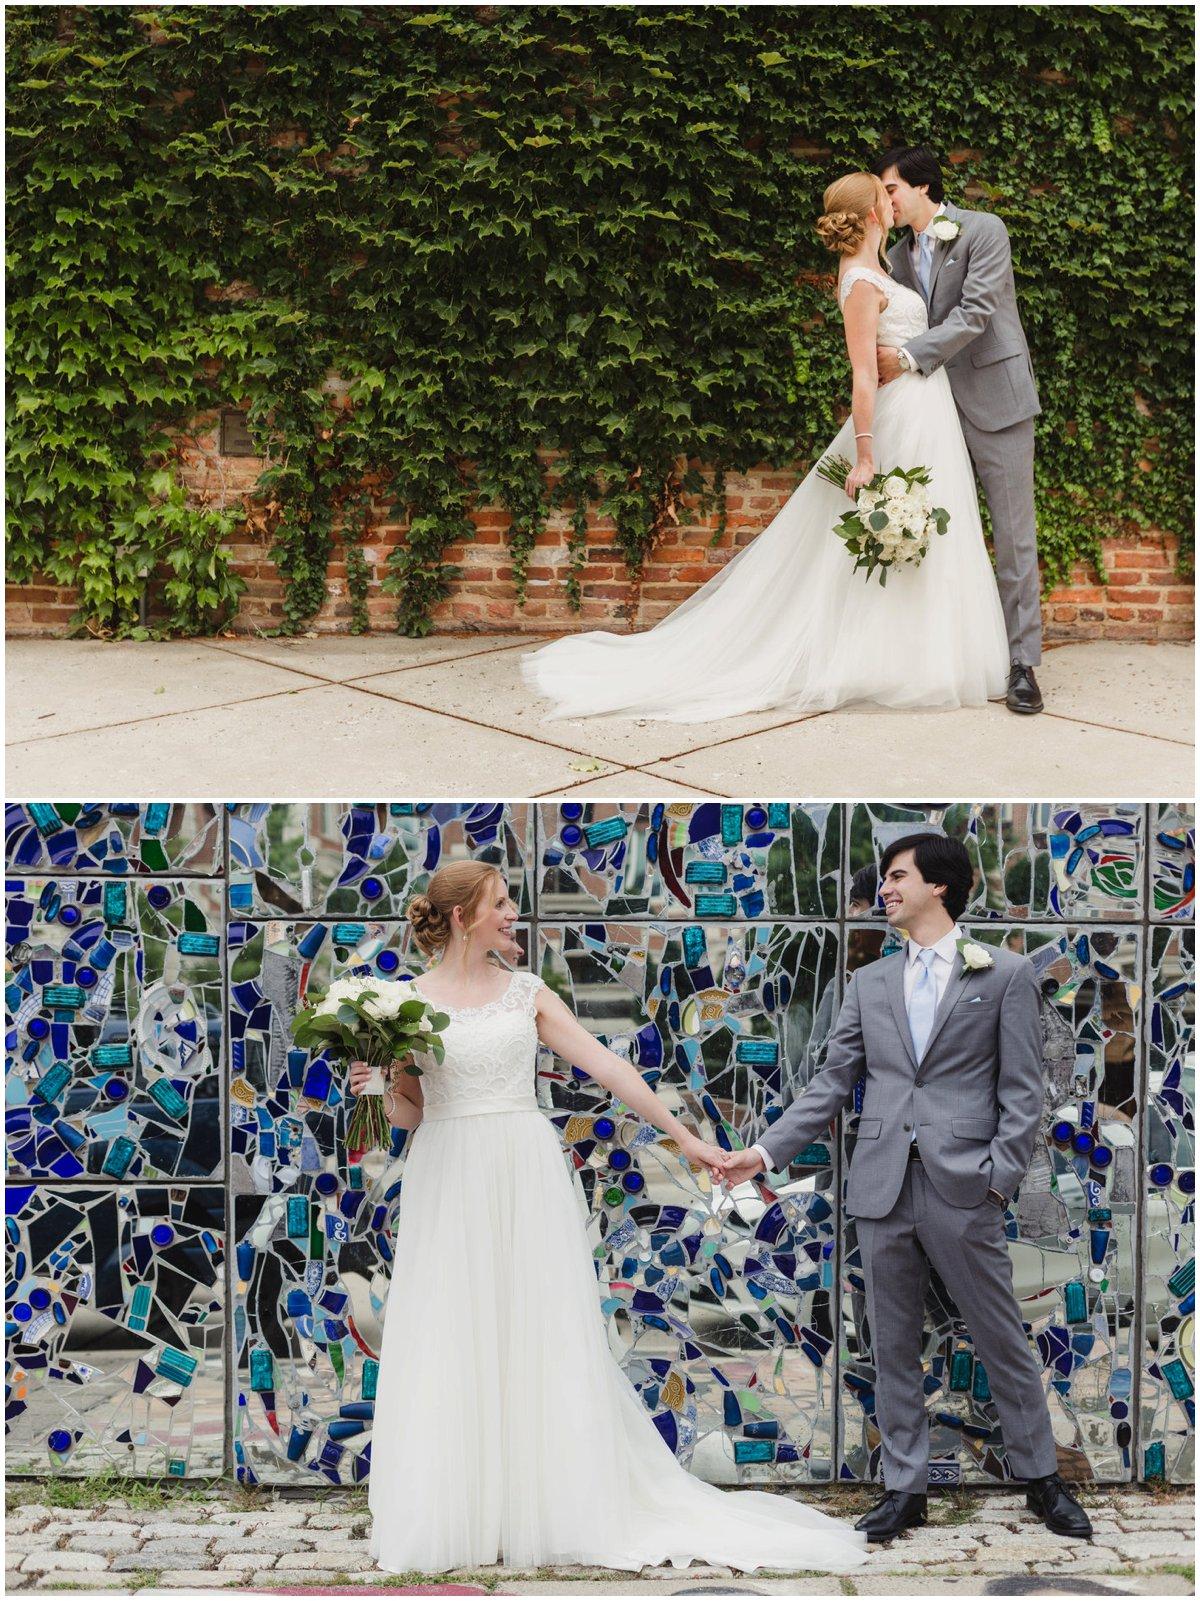 urban-row-photography-rosewood-farms-just-married-wedding-portraits_0015.jpg